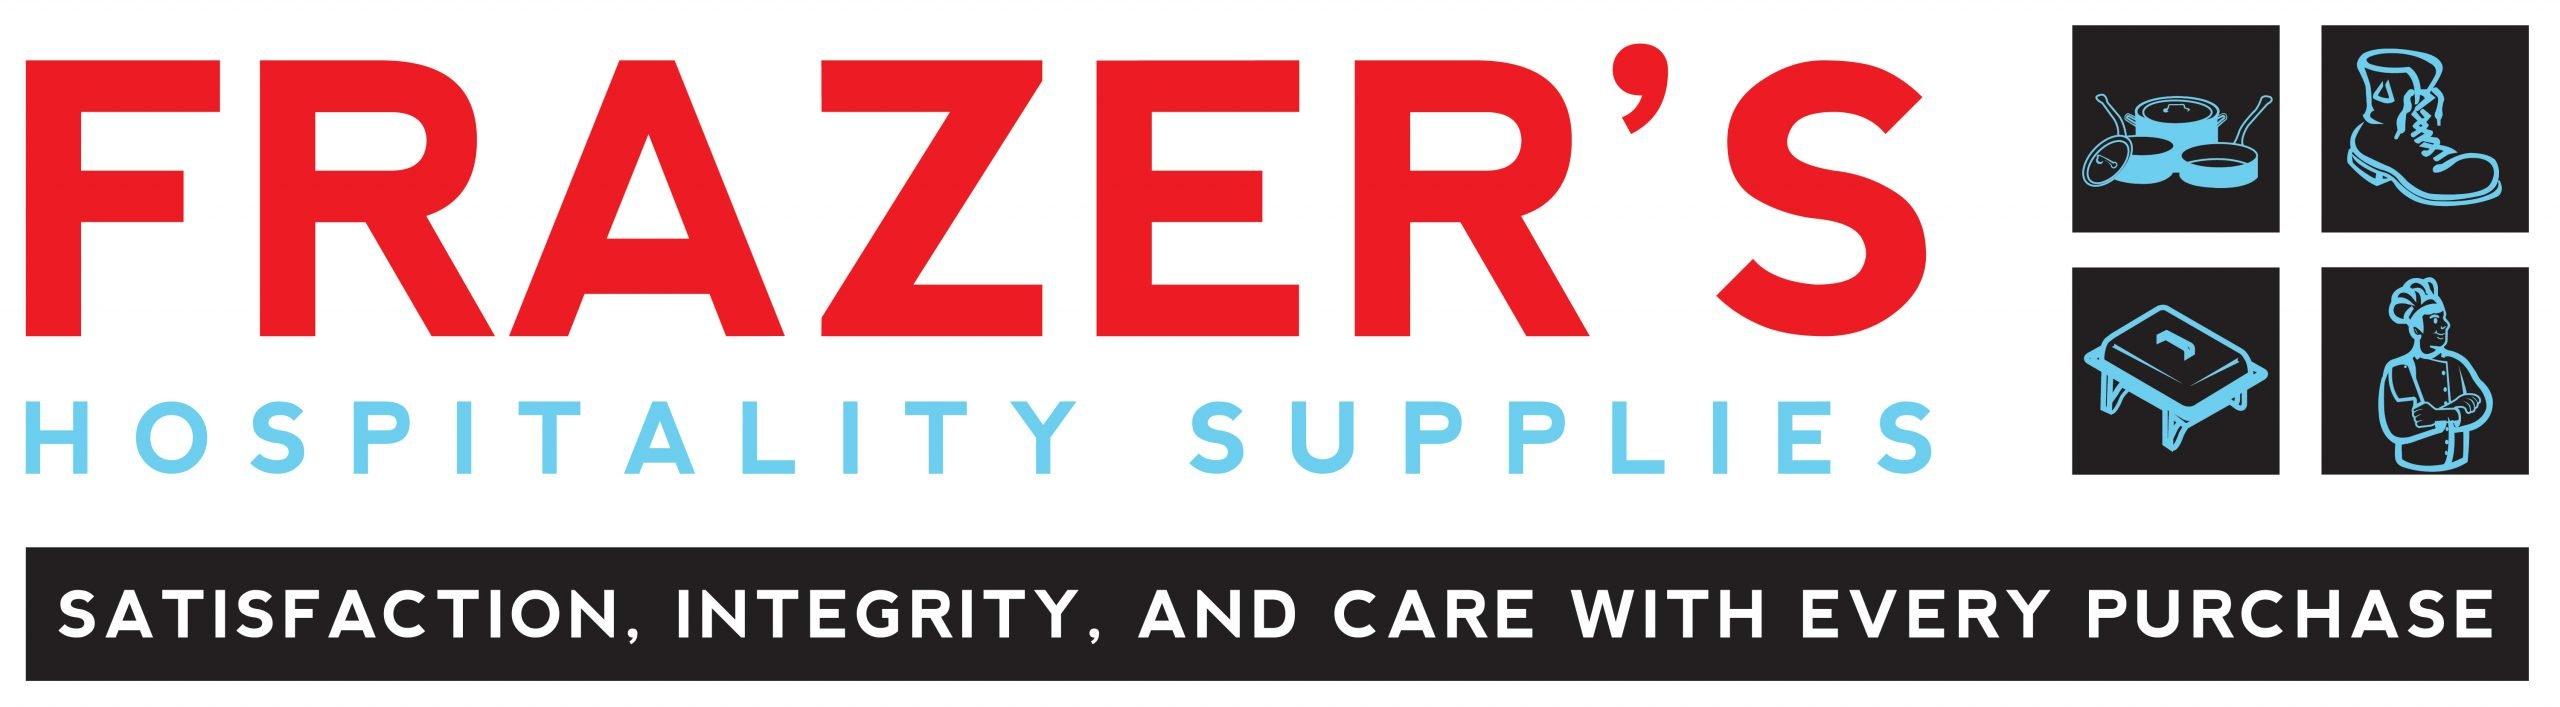 Frazer's Hospitality Supplies